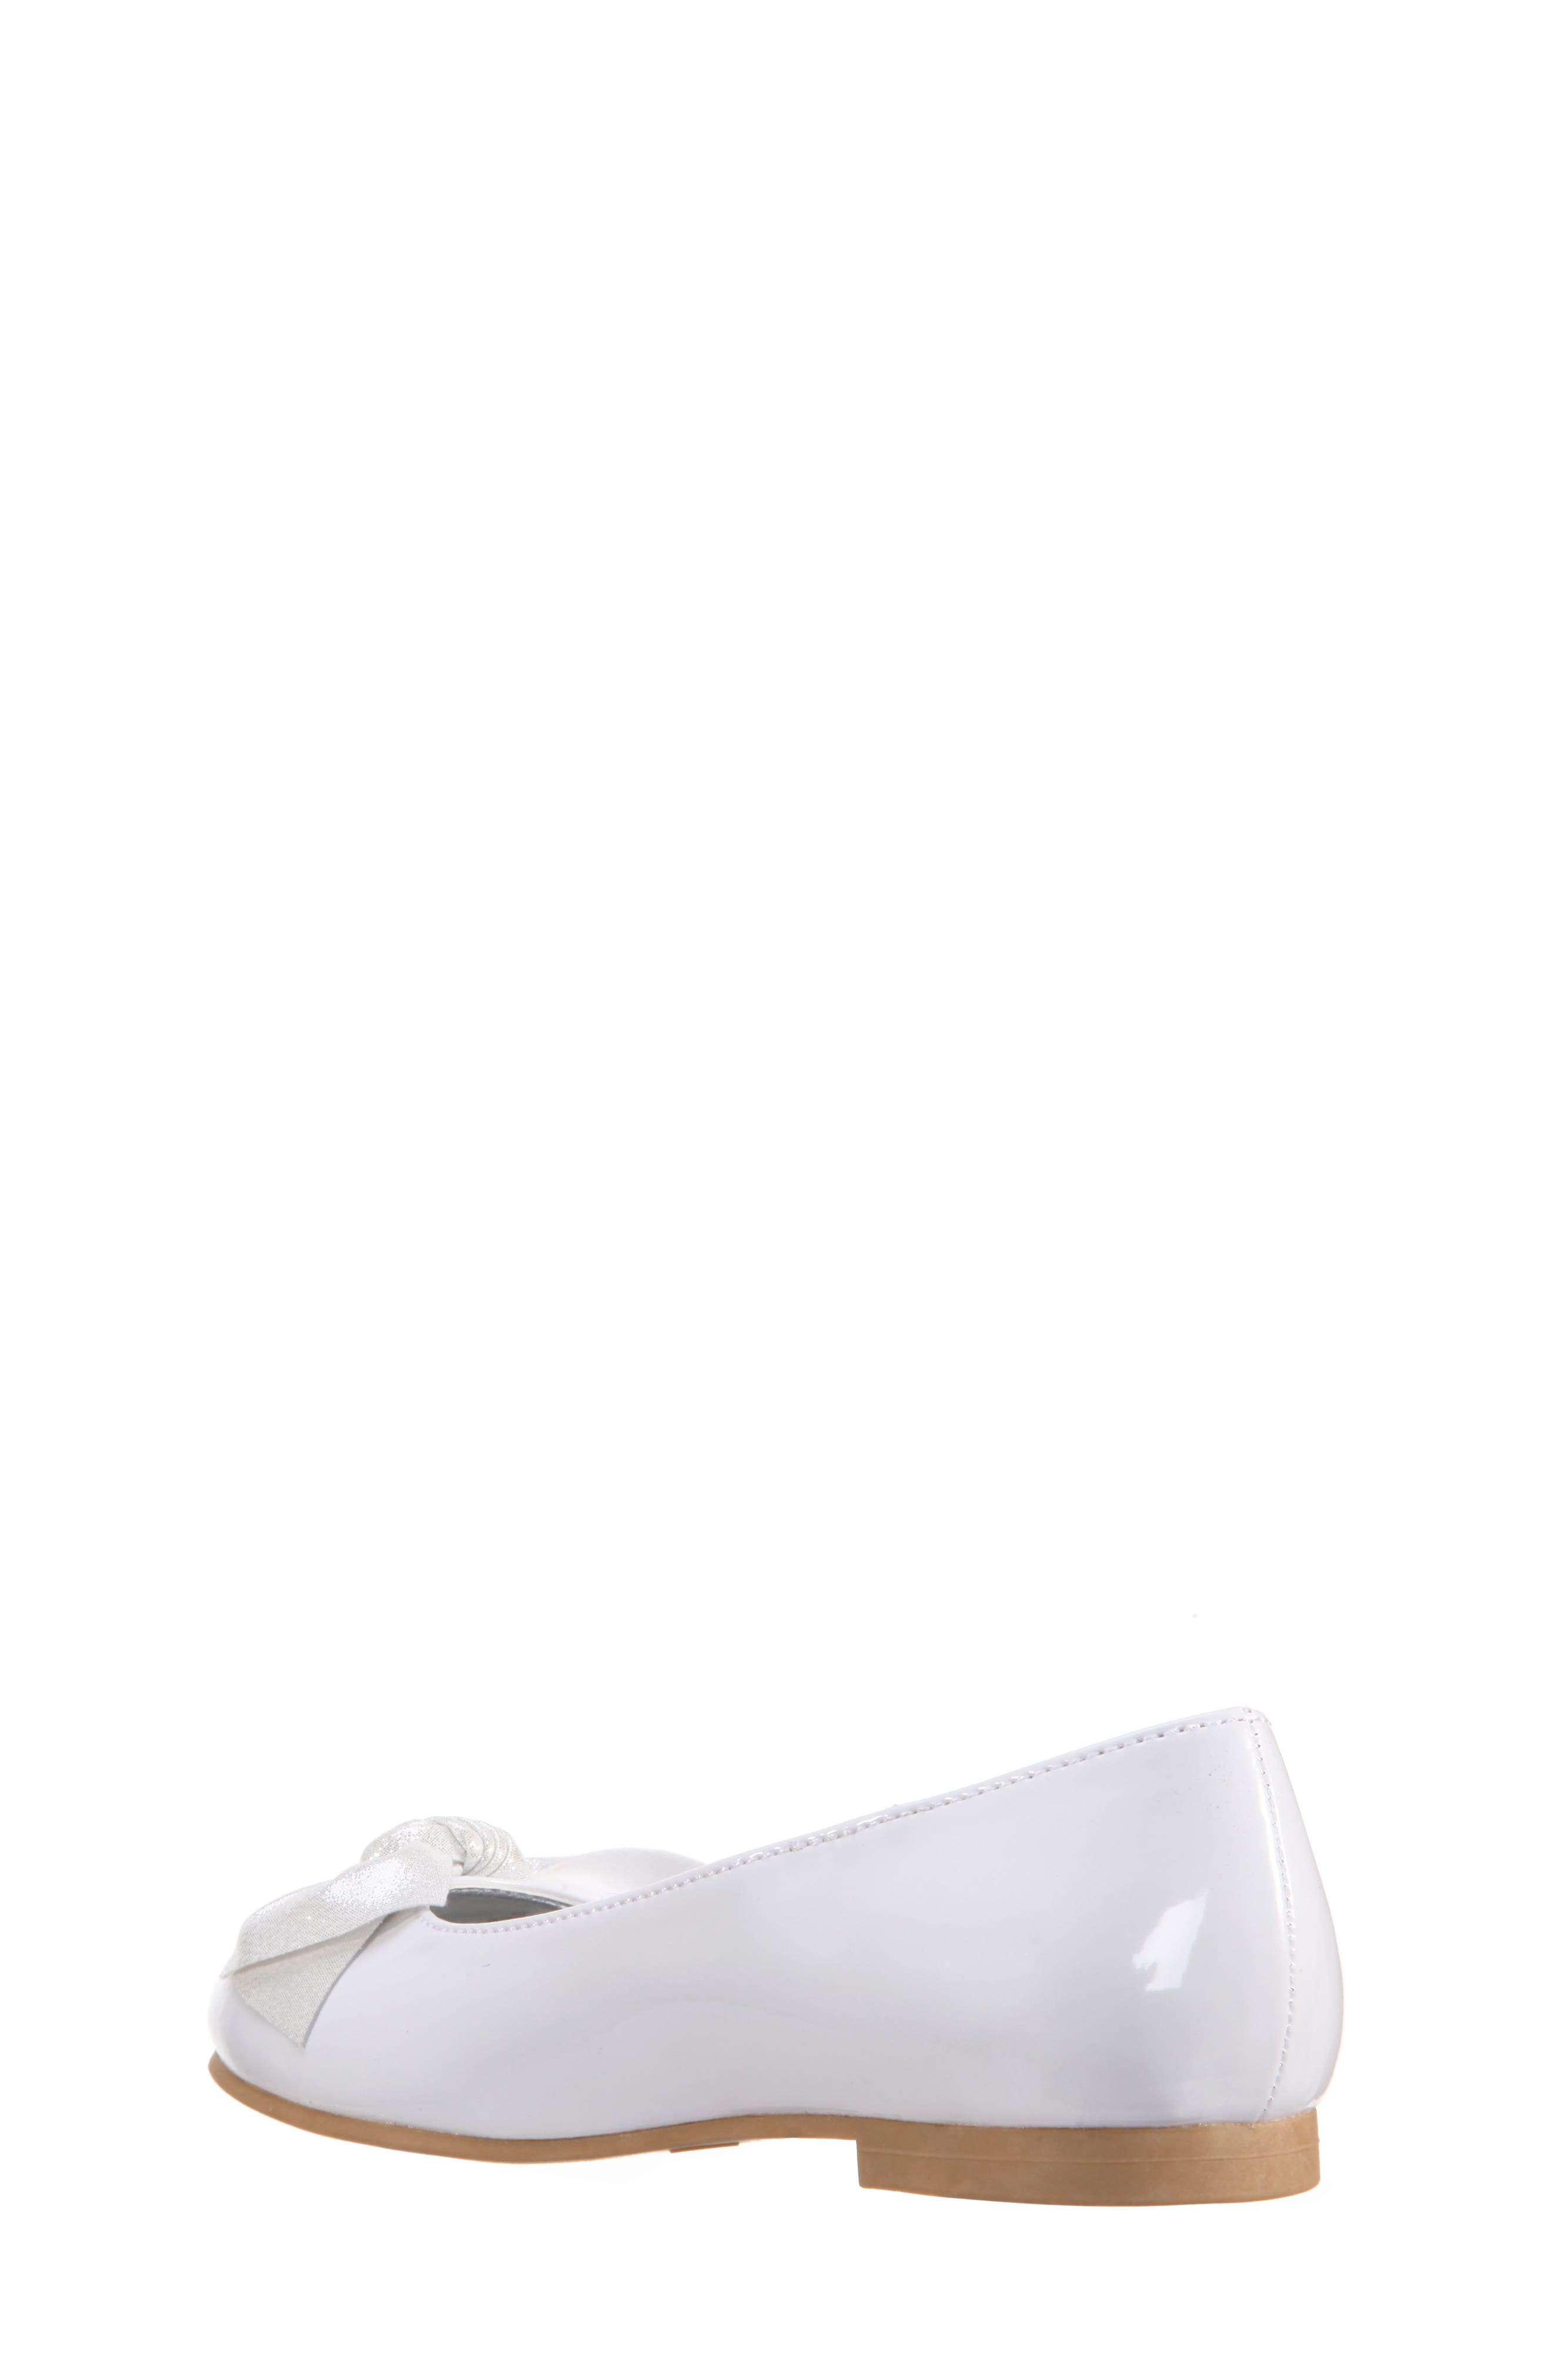 Katelyn Glitter Bow Metallic Ballet Flat,                             Alternate thumbnail 2, color,                             White Patent